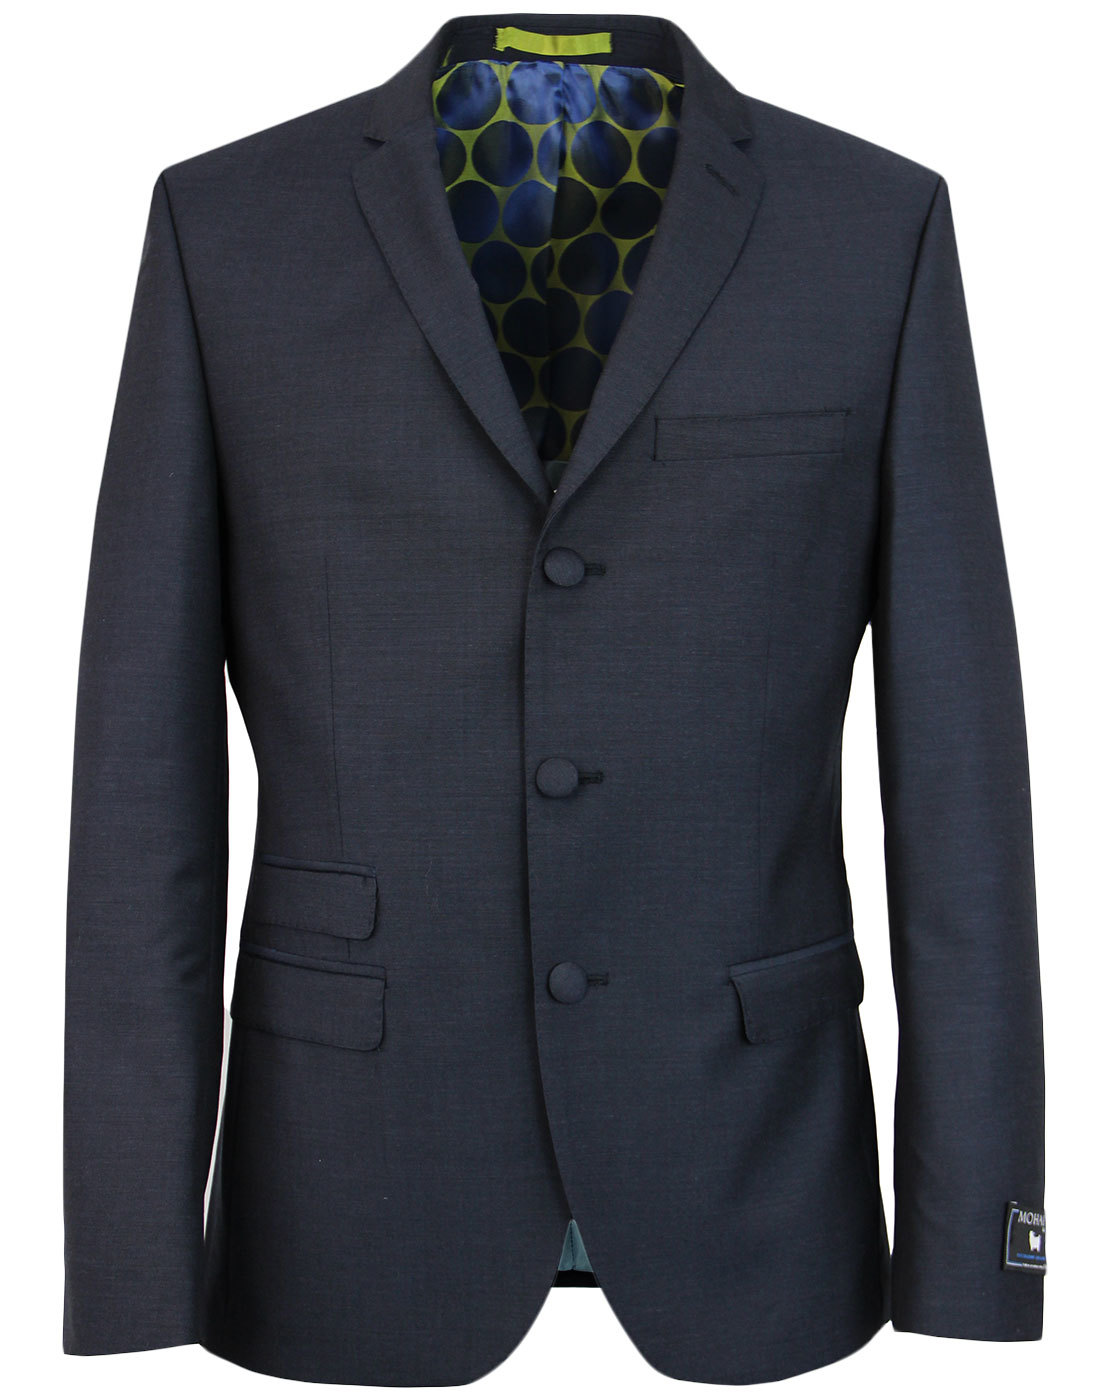 madcap england mohair 3 button suit jacket navy